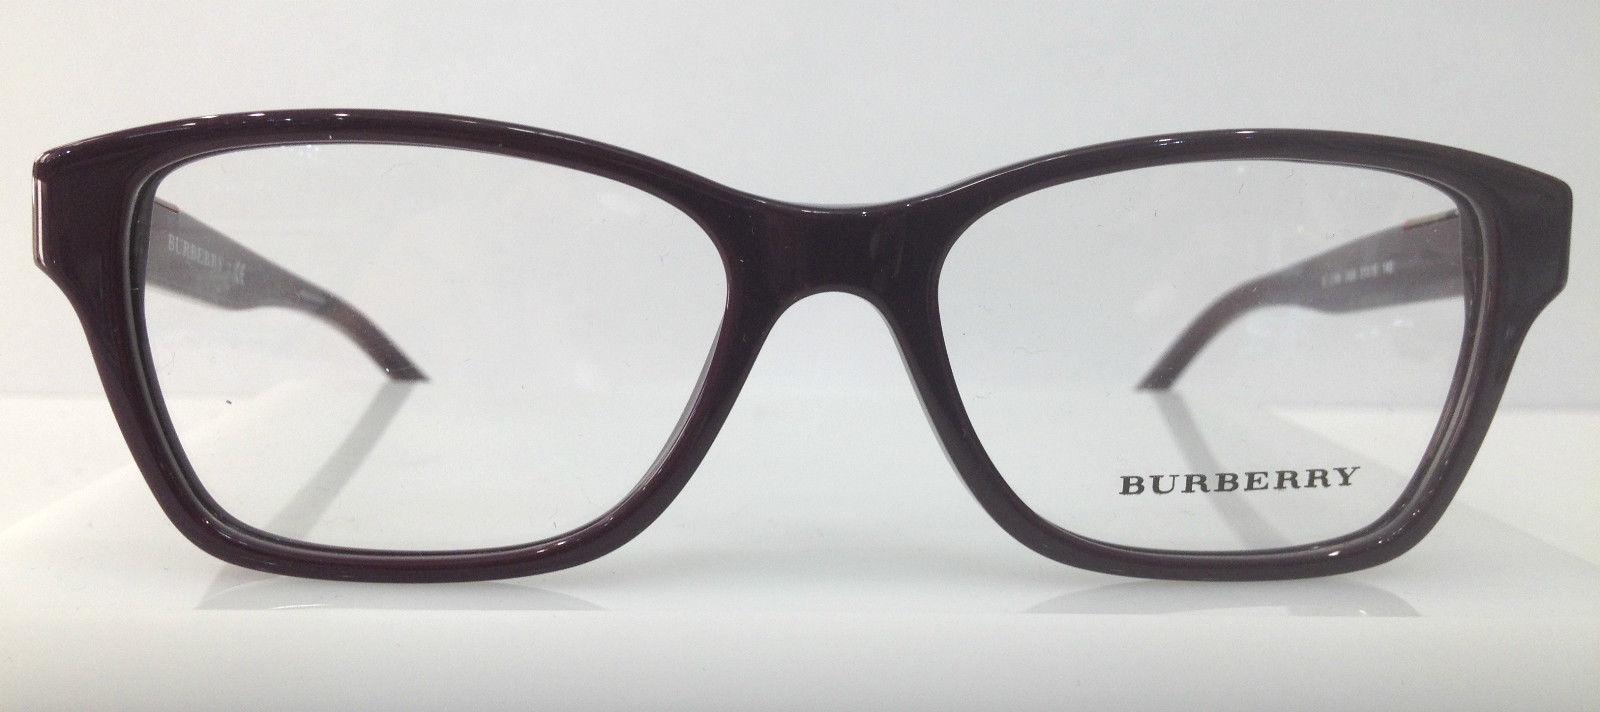 Burberry Glasses Frame Parts : BURBERRY B 2144 Purple 3424 Plastic Eyeglasses Frame 51-16 ...